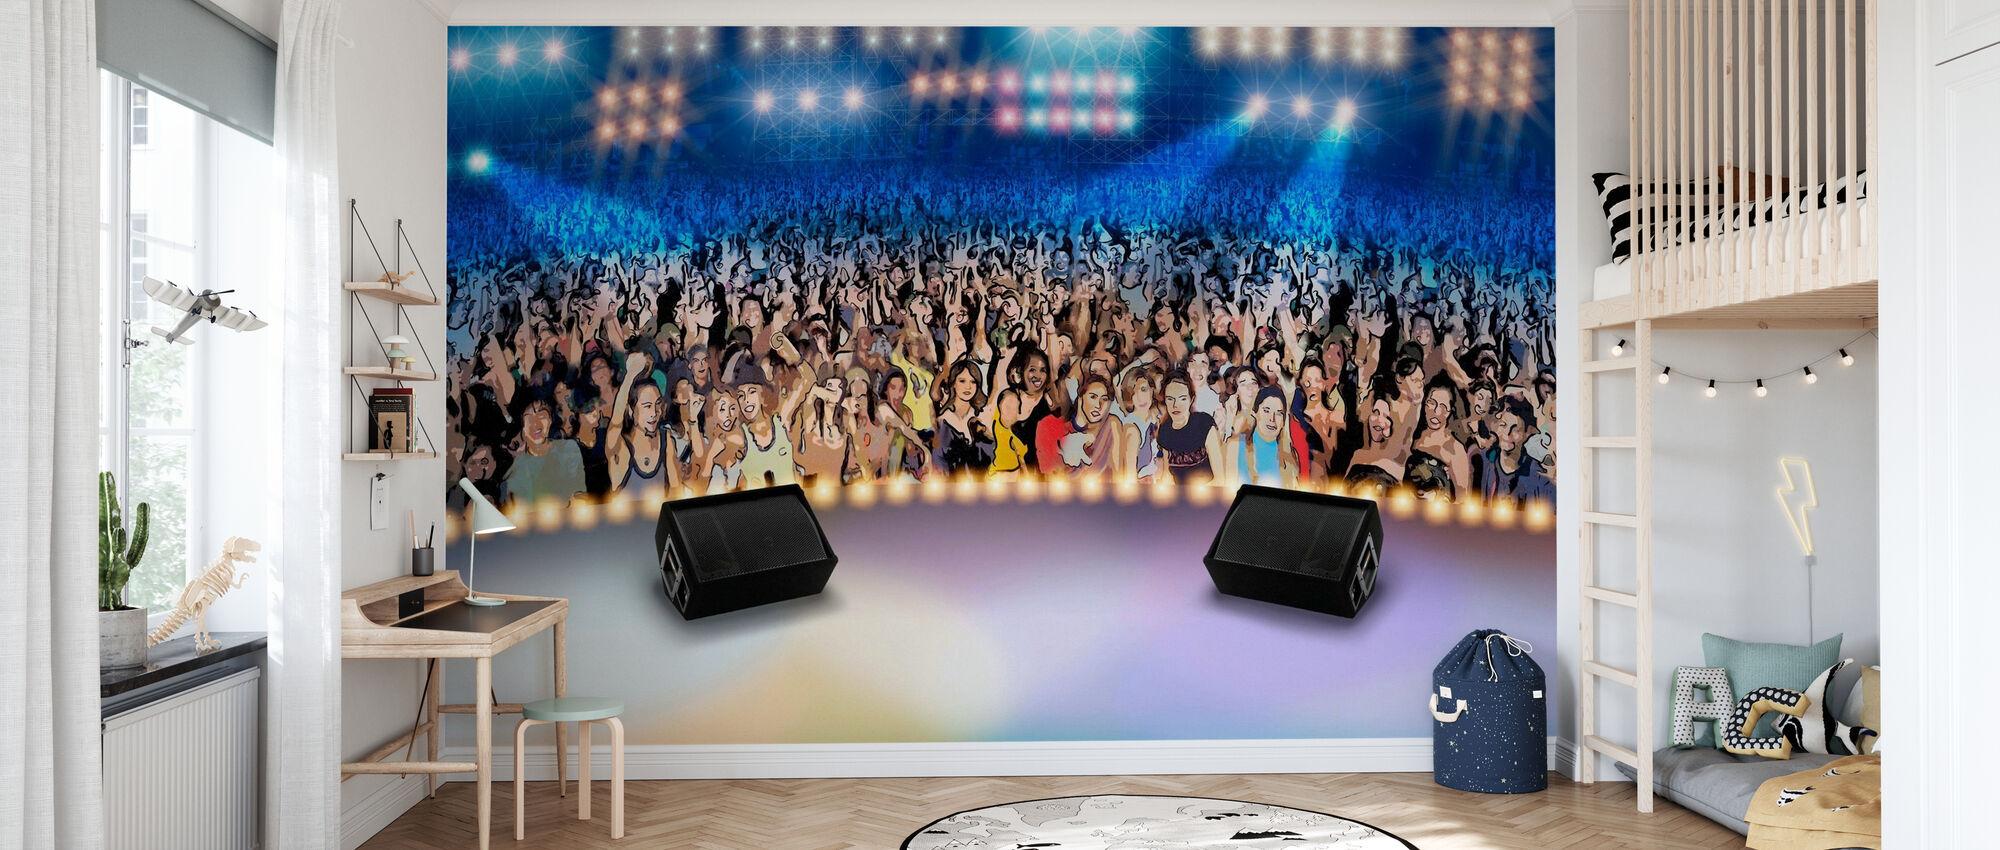 On Stage - Wallpaper - Kids Room